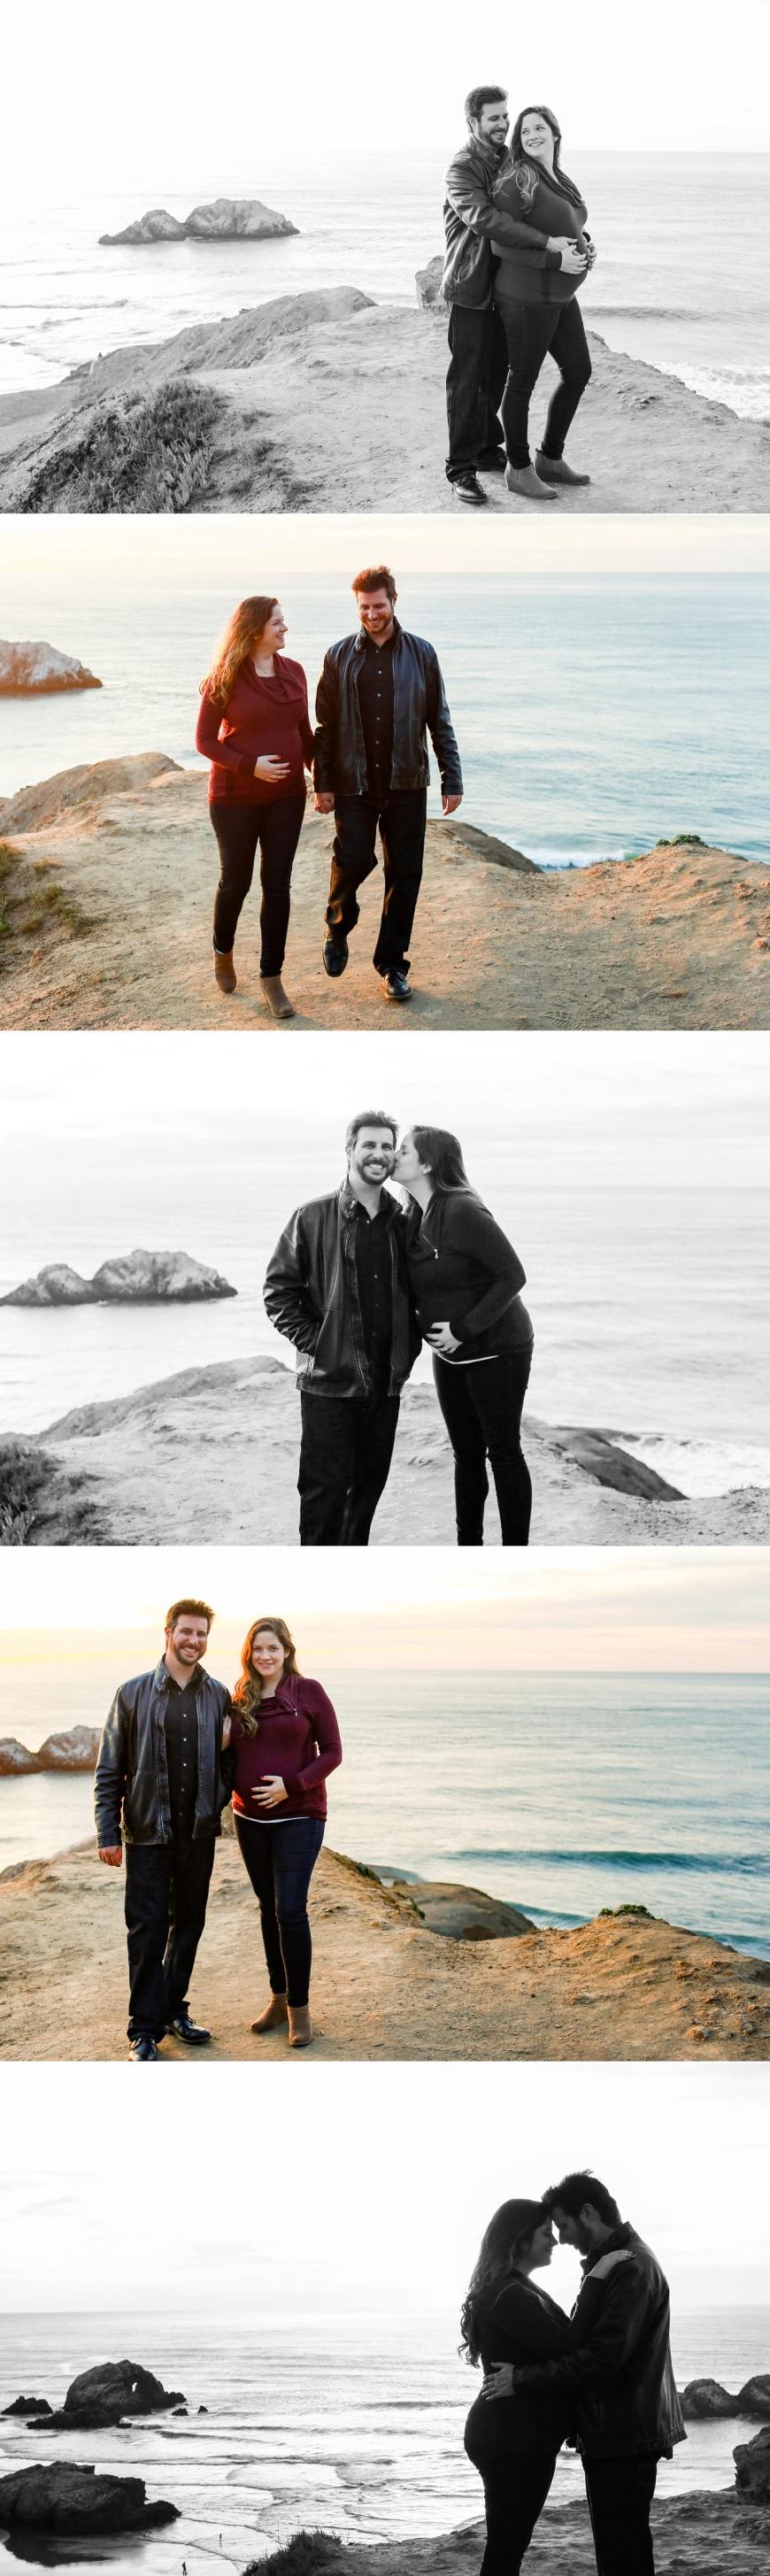 Land's-End-San-Francisco-Maternity-Photographer_1008.jpg